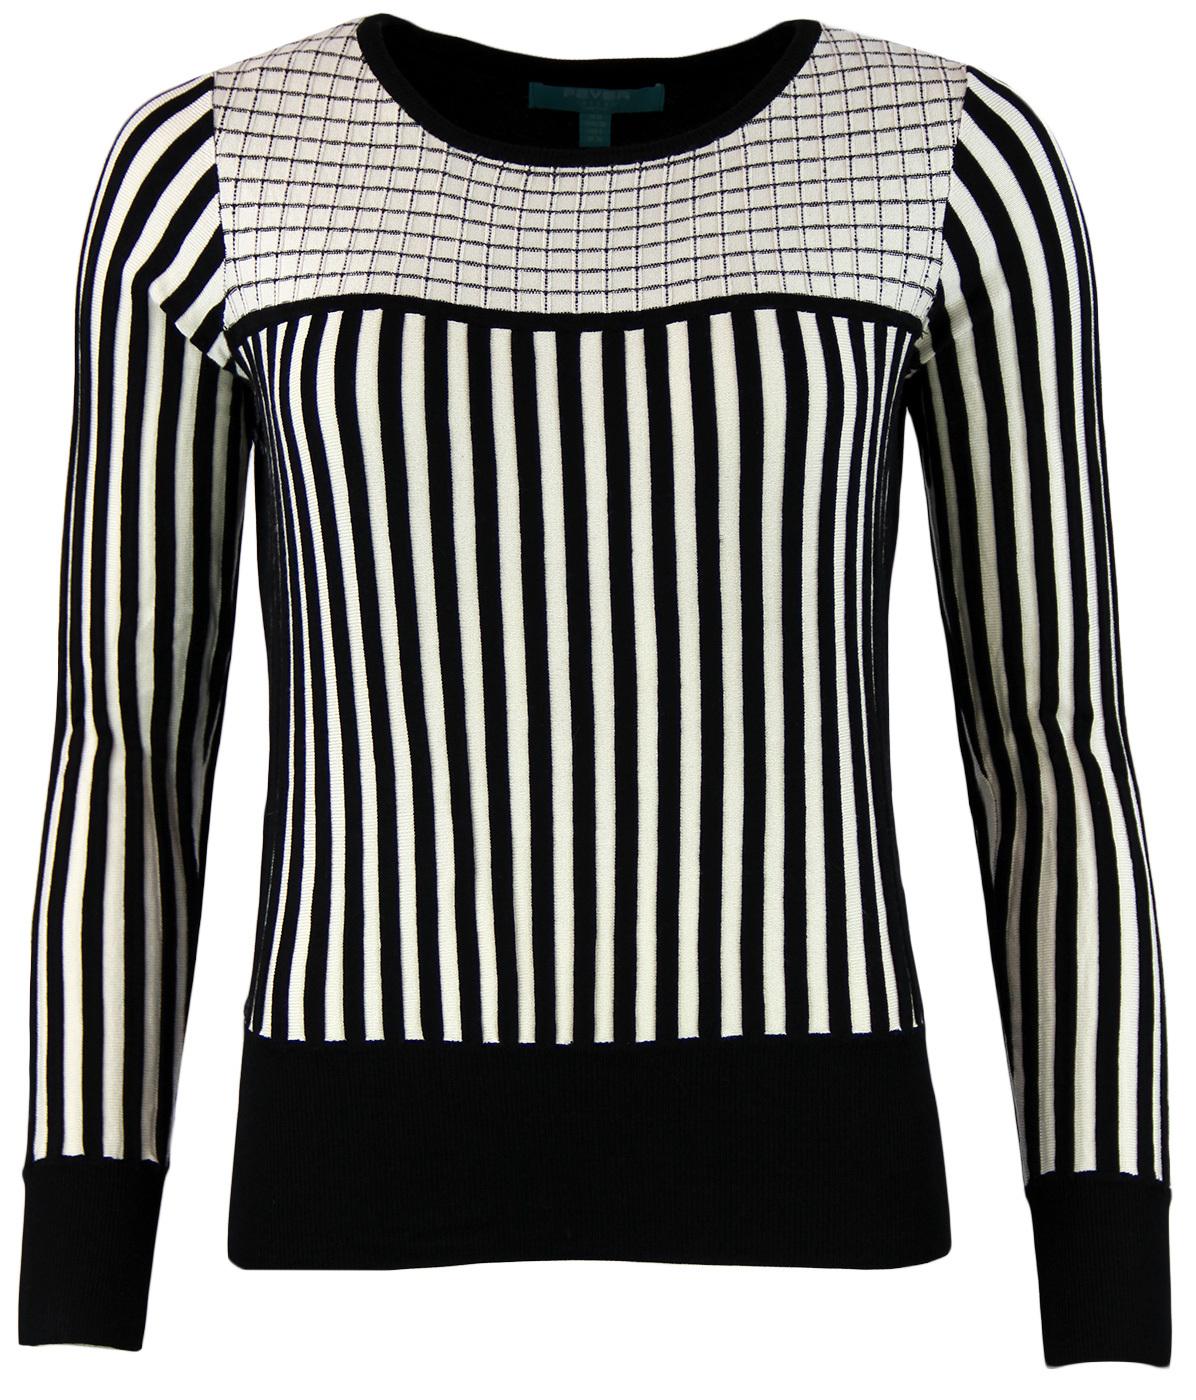 Lewes FEVER Retro Vintage Womens Stripe Sweater